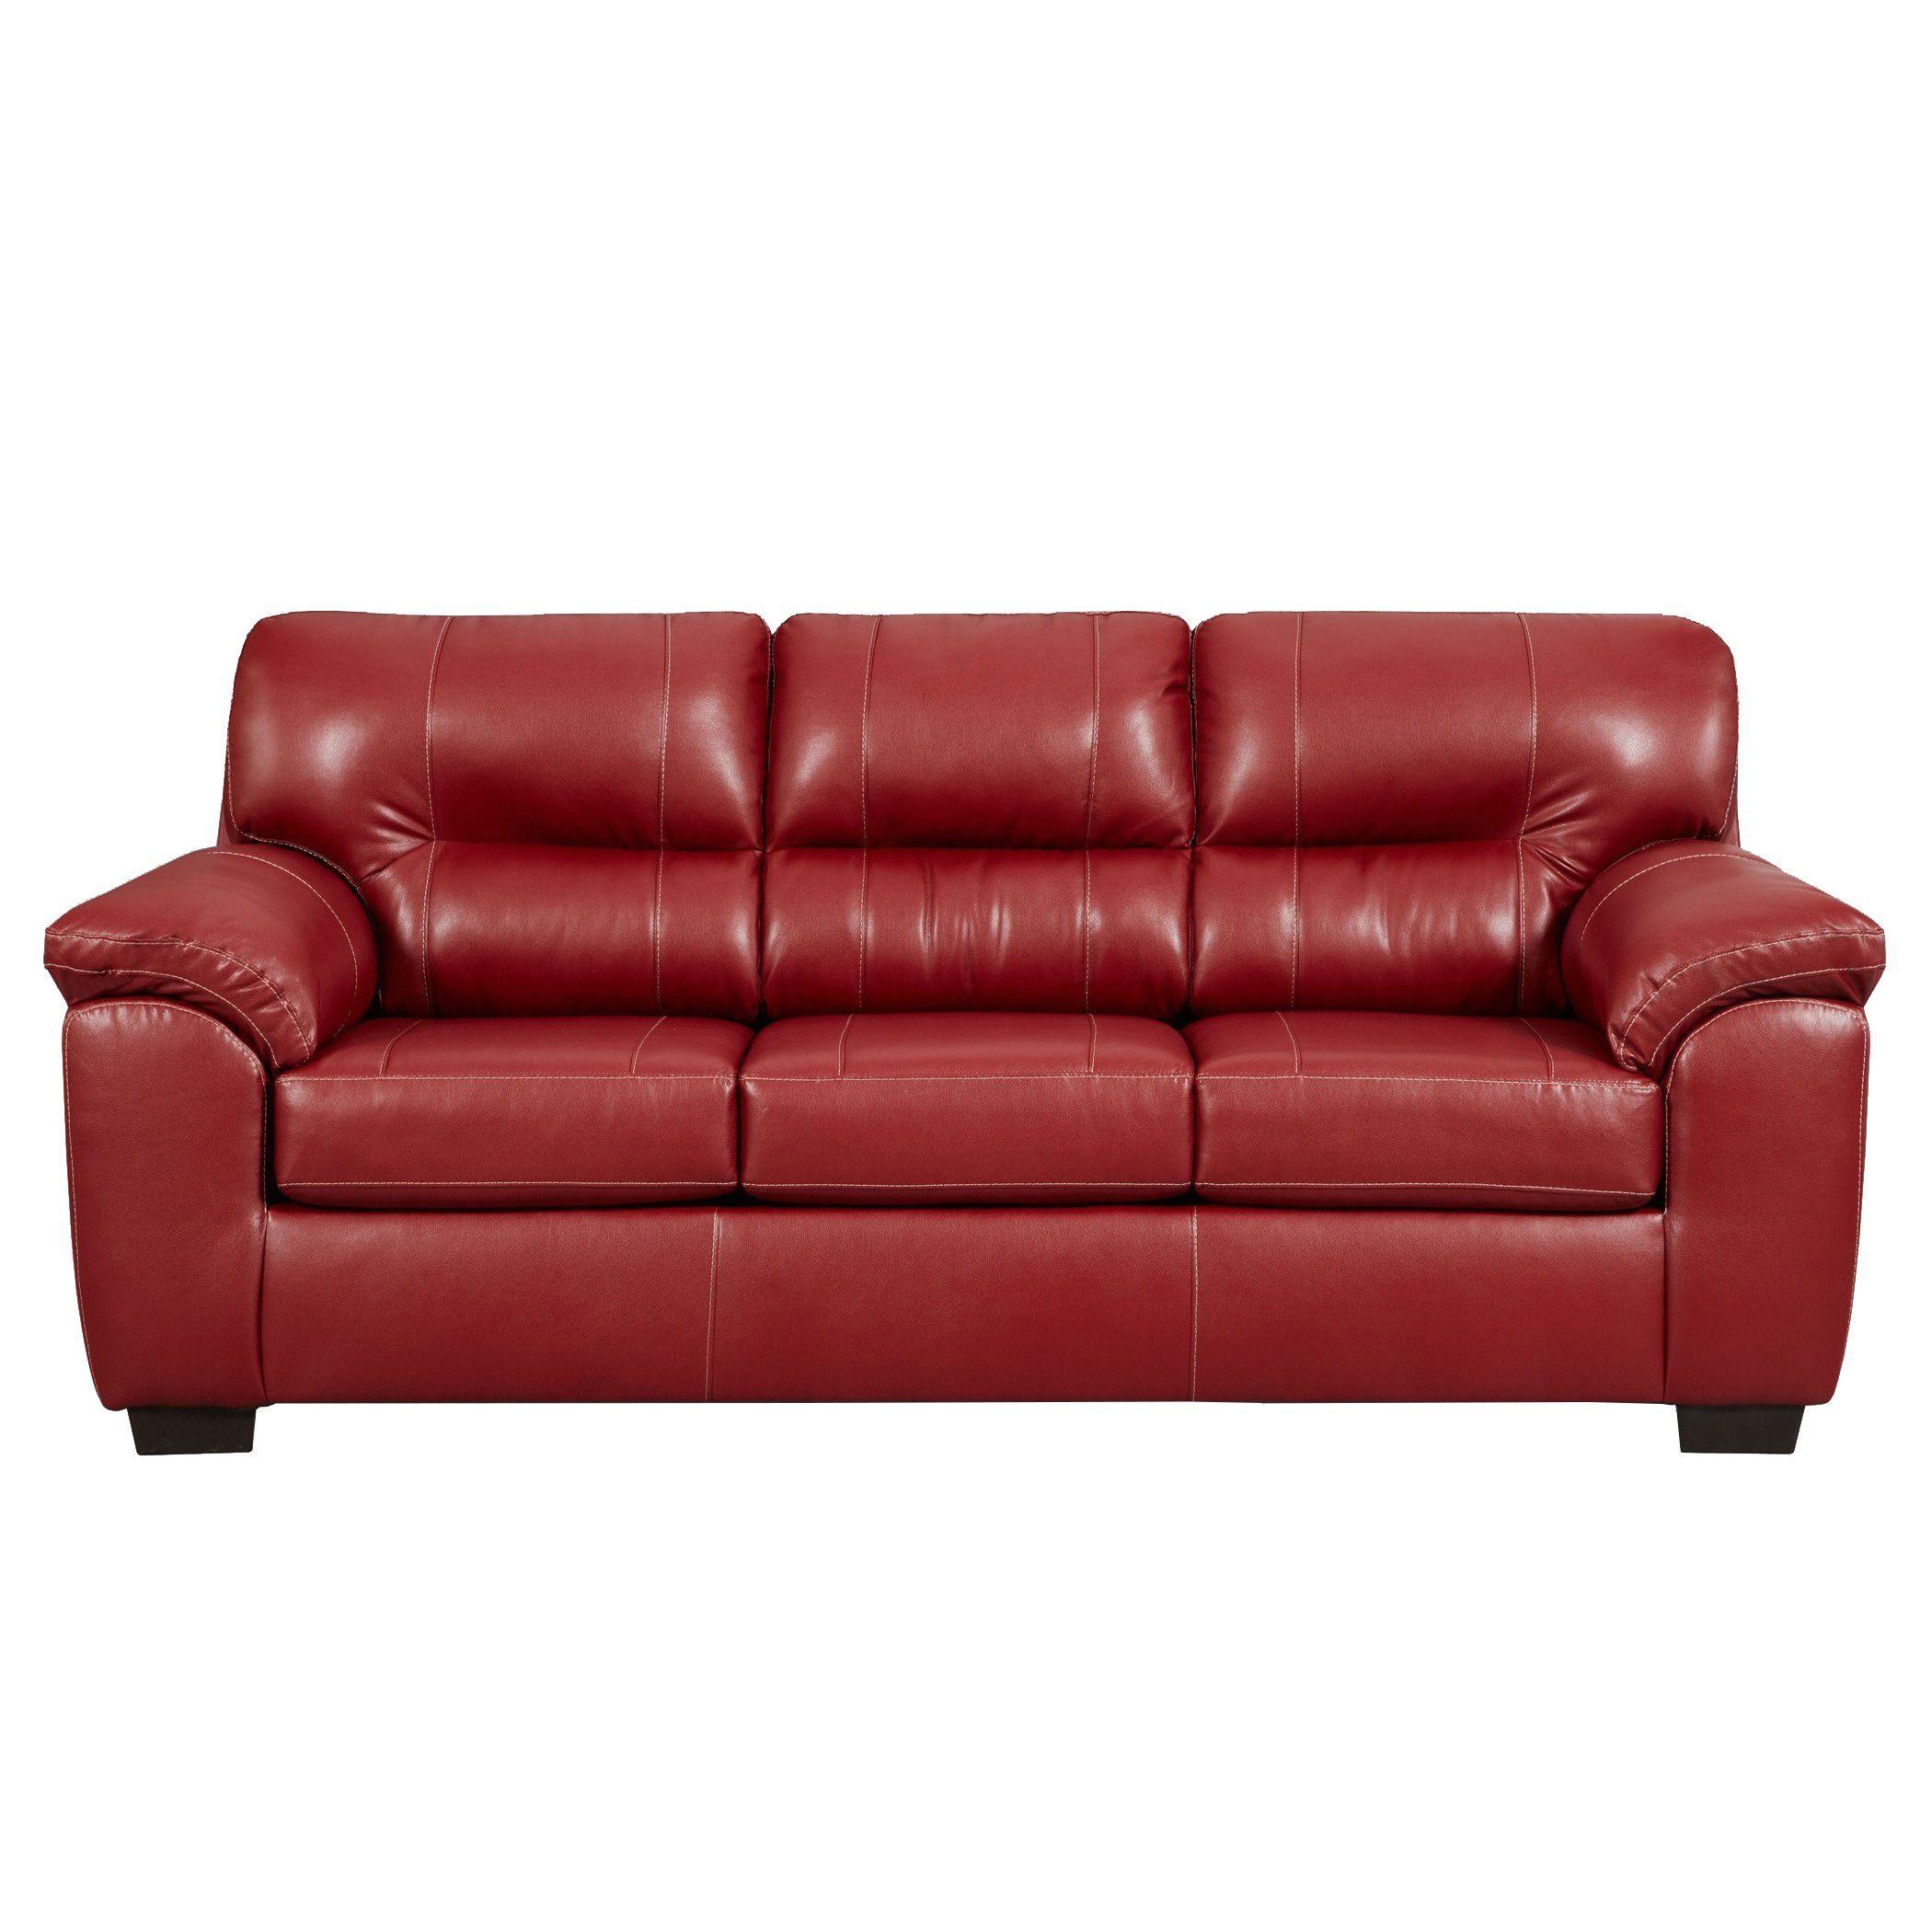 sofa trendz corina red sofa corina sofa red faux leather rh in pinterest com